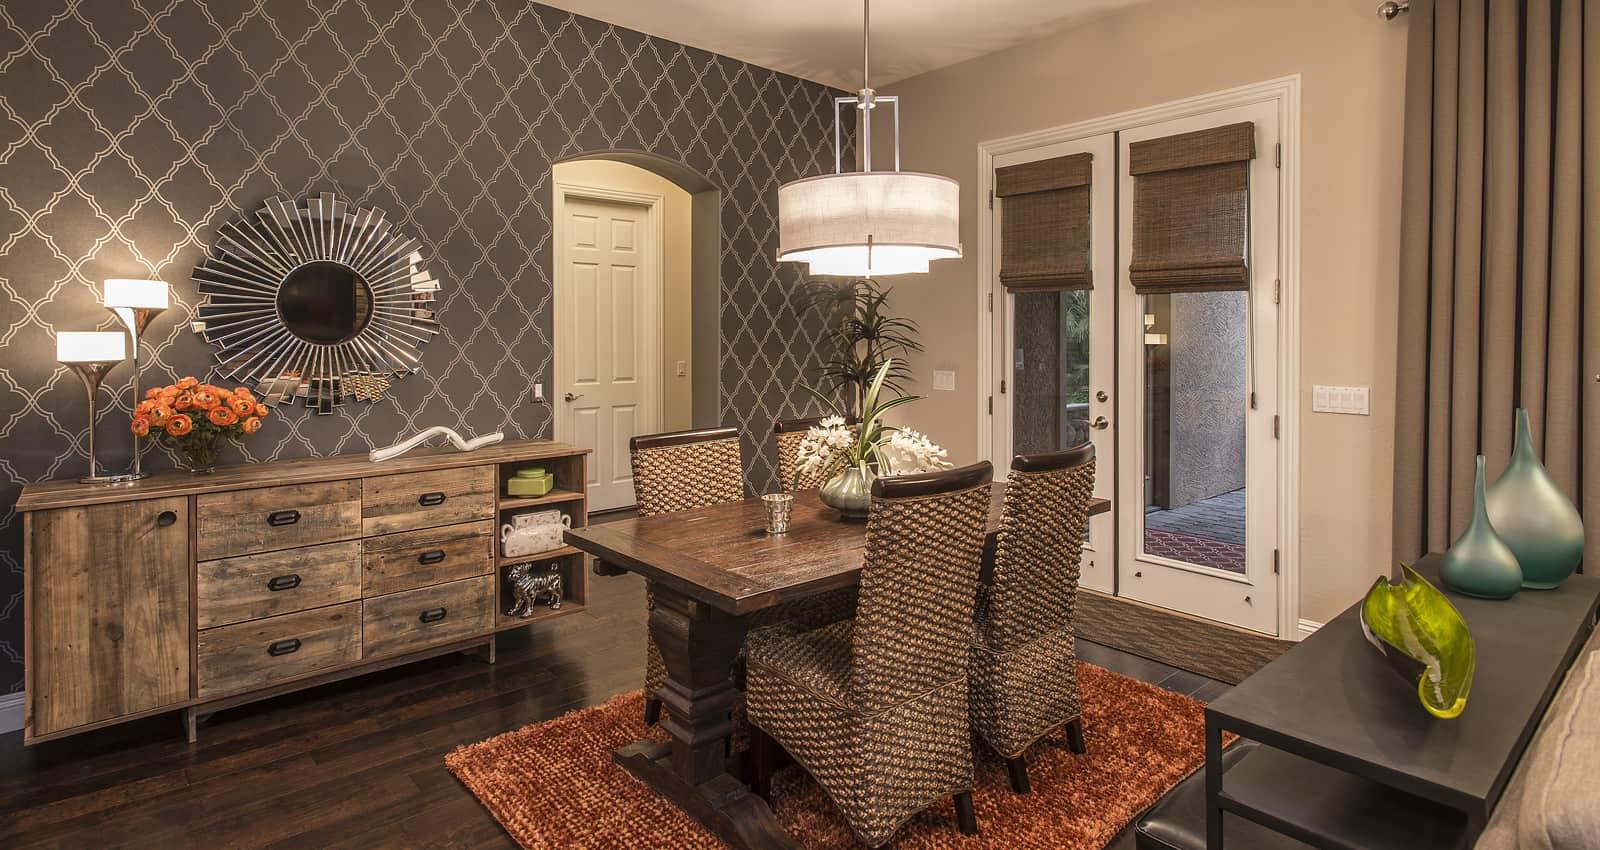 Central Phoenix Interior Design - Interior Design by Elle ...